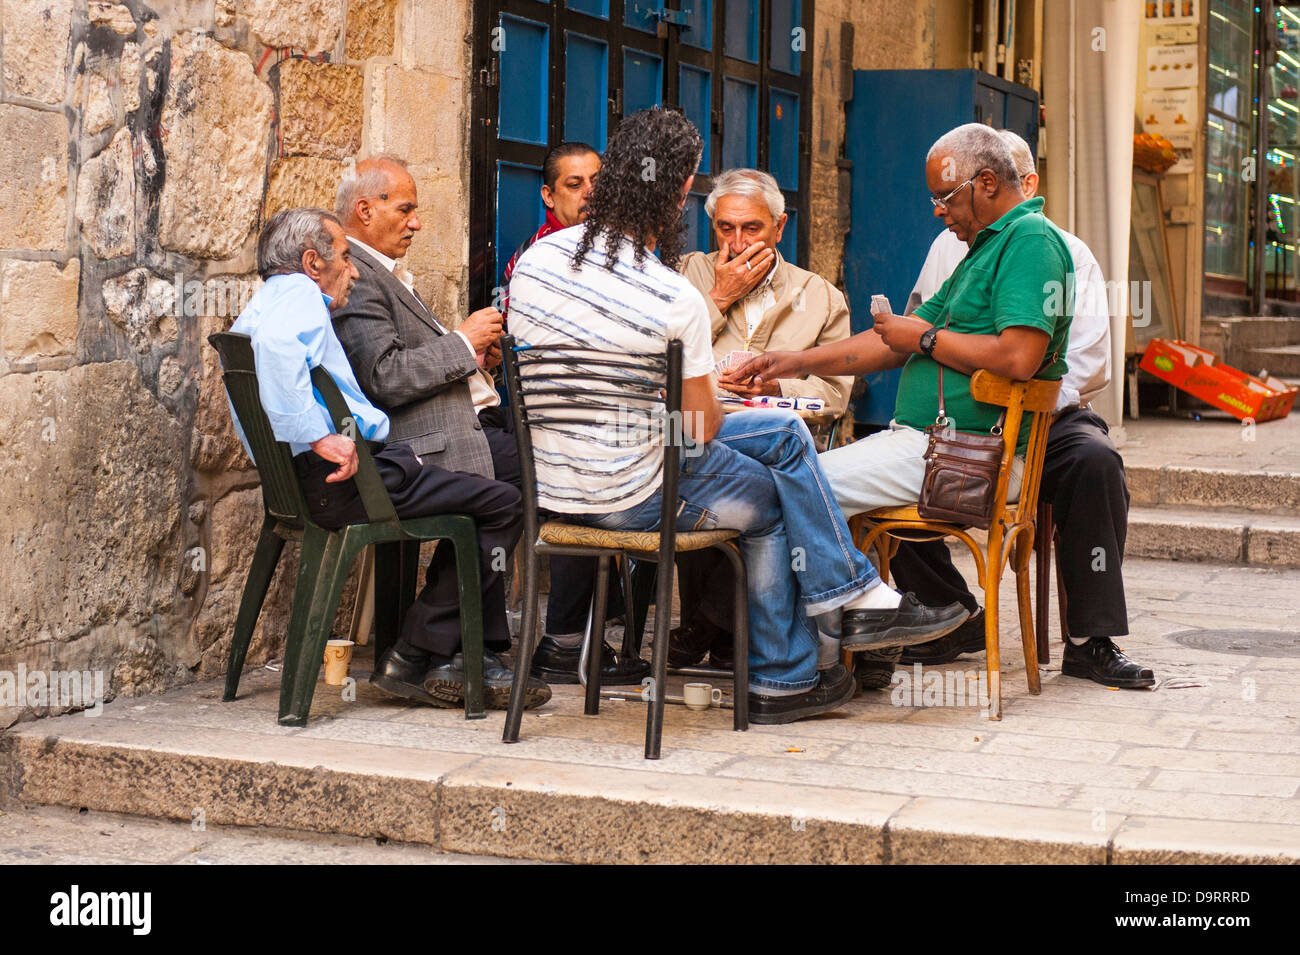 Israel Old City Jerusalem street scene intense group of Arab Muslim men playing cards card game seated around table - Stock Image